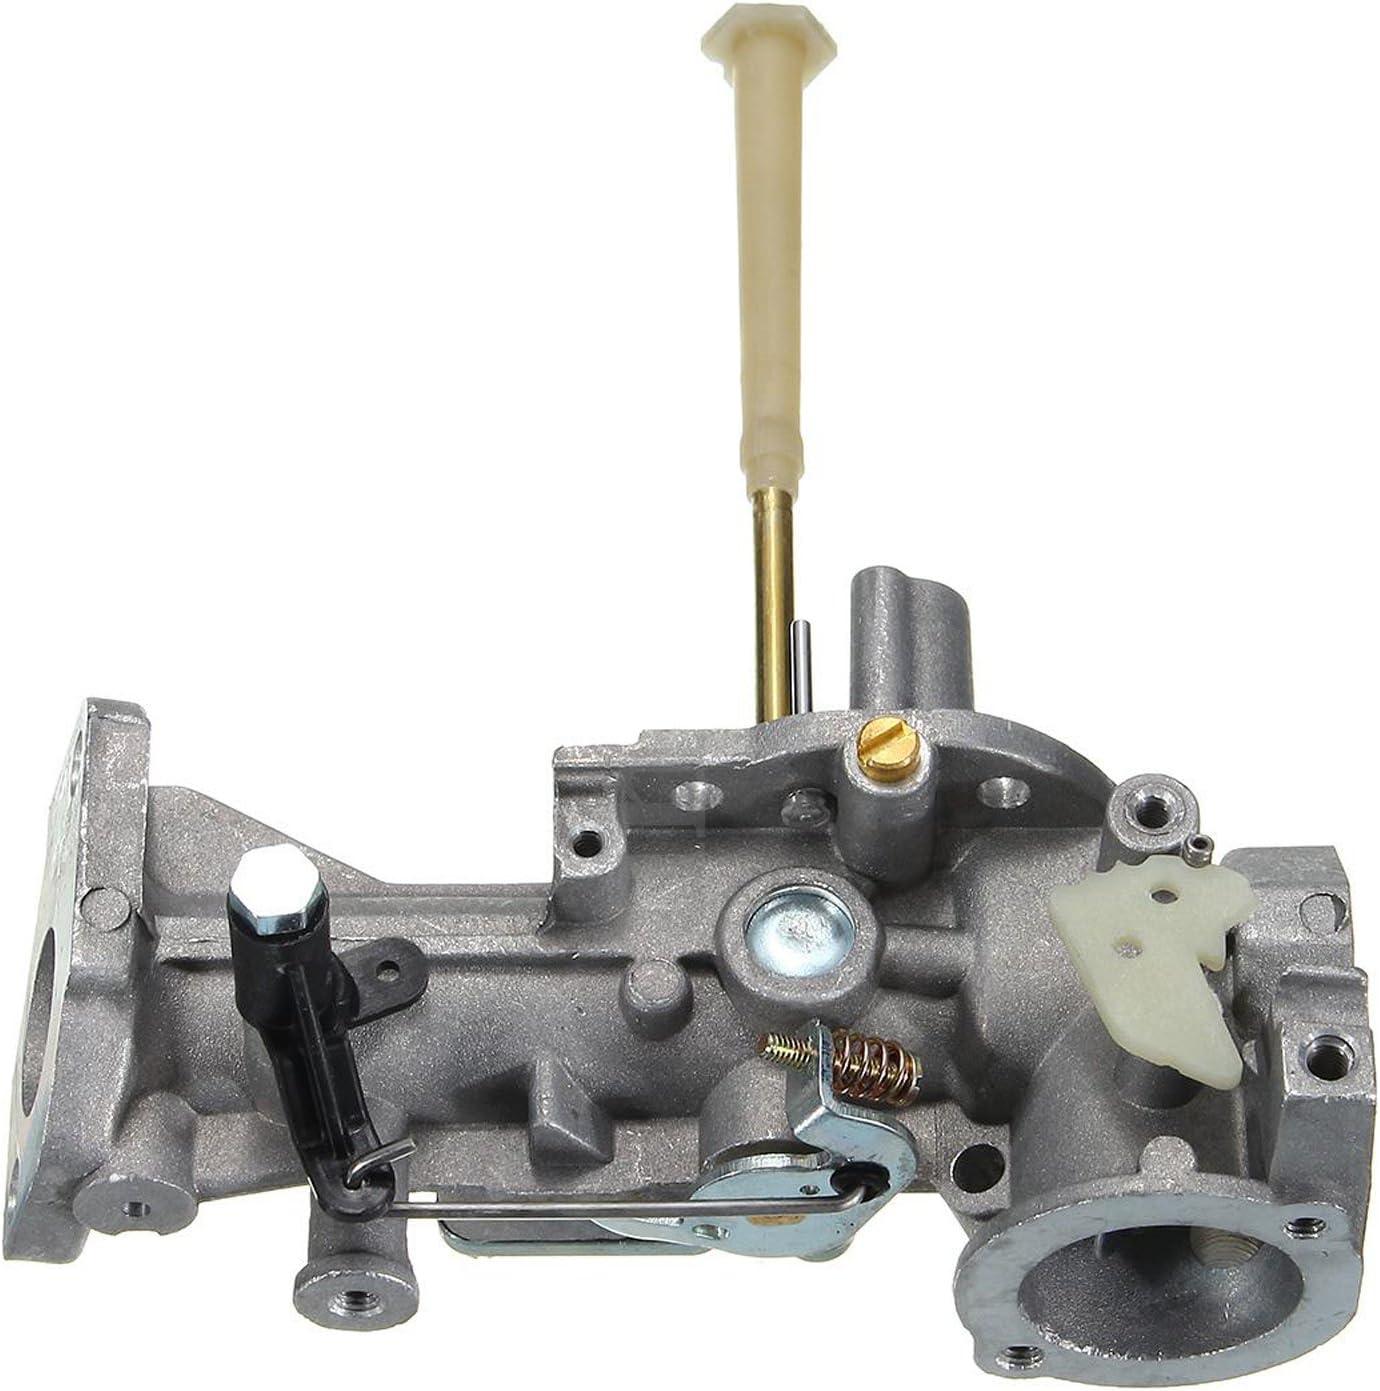 Briggs/&Stratton Carburetor for 135207 135202 135212 135217 135232 Series